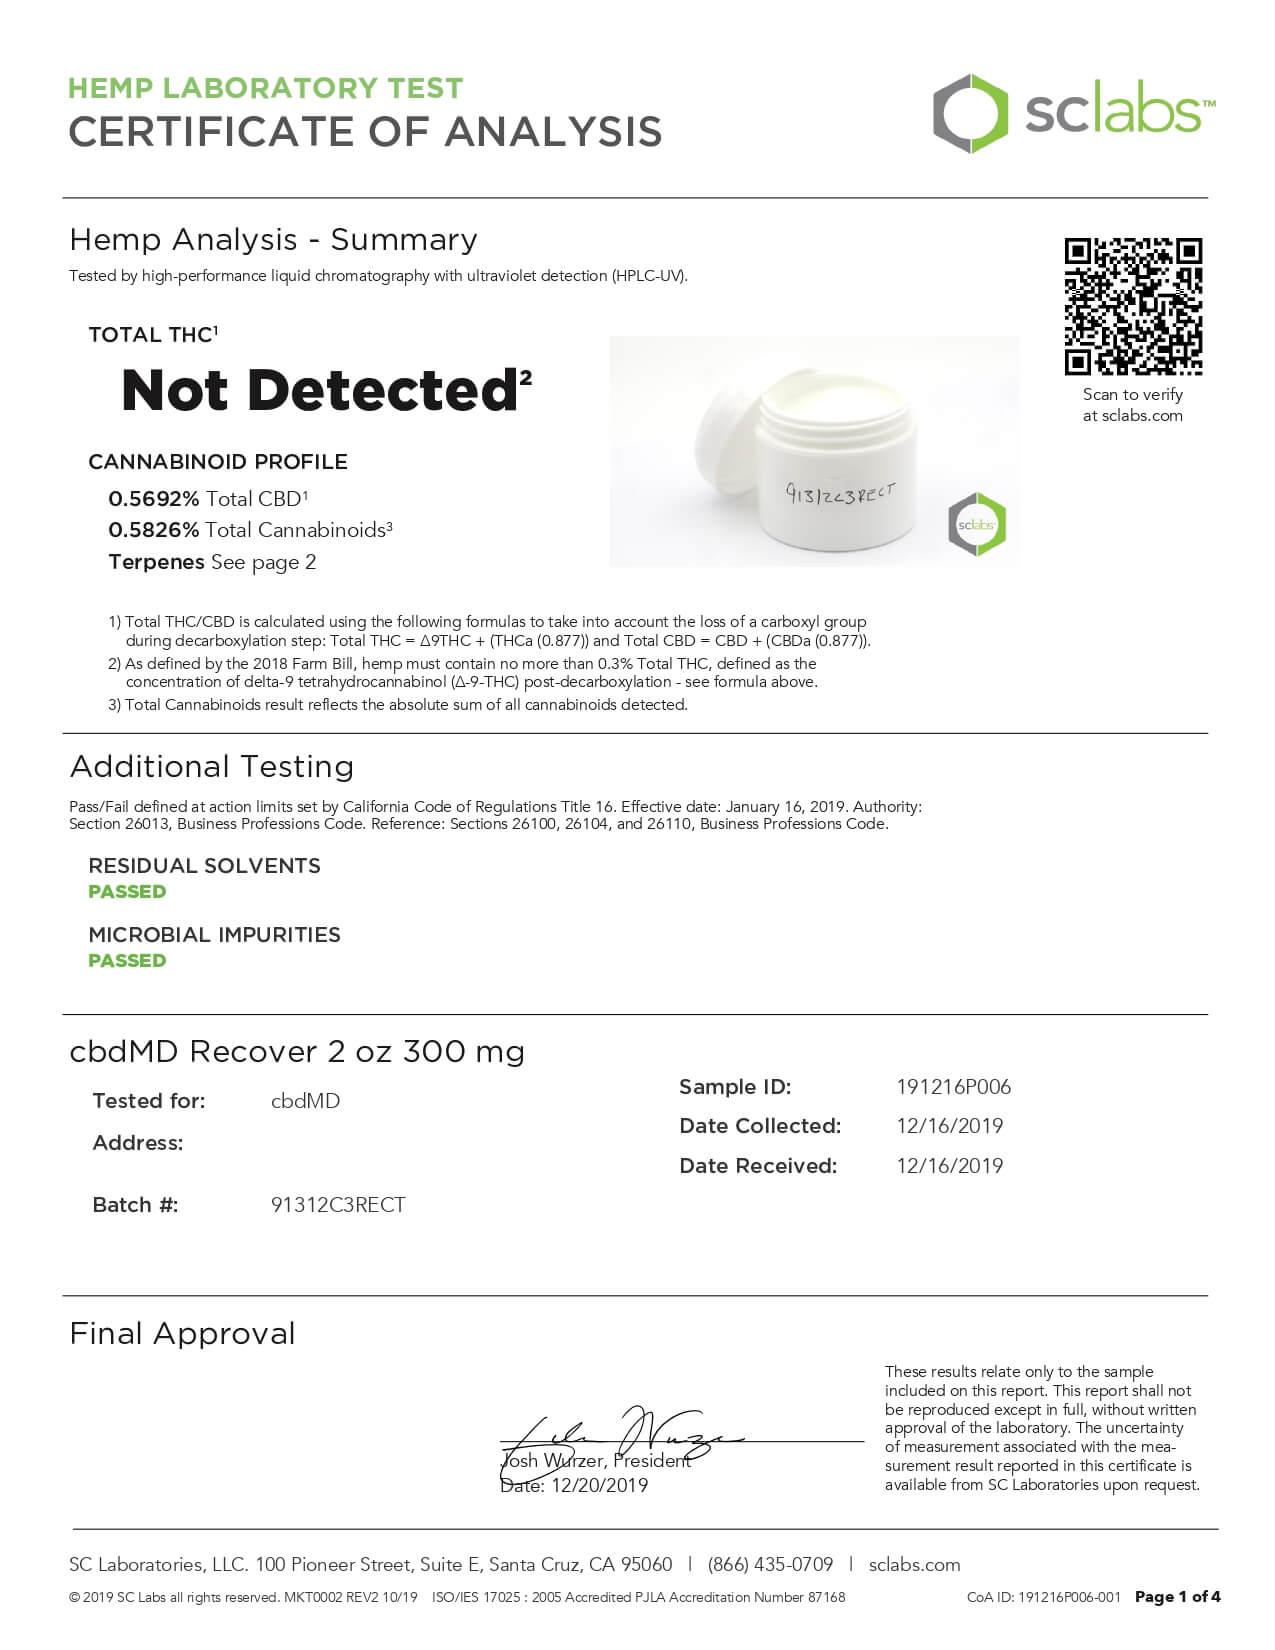 cbdMD CBD Topical Recover Inflammation Cream 2oz Tub 300mg Lab Report